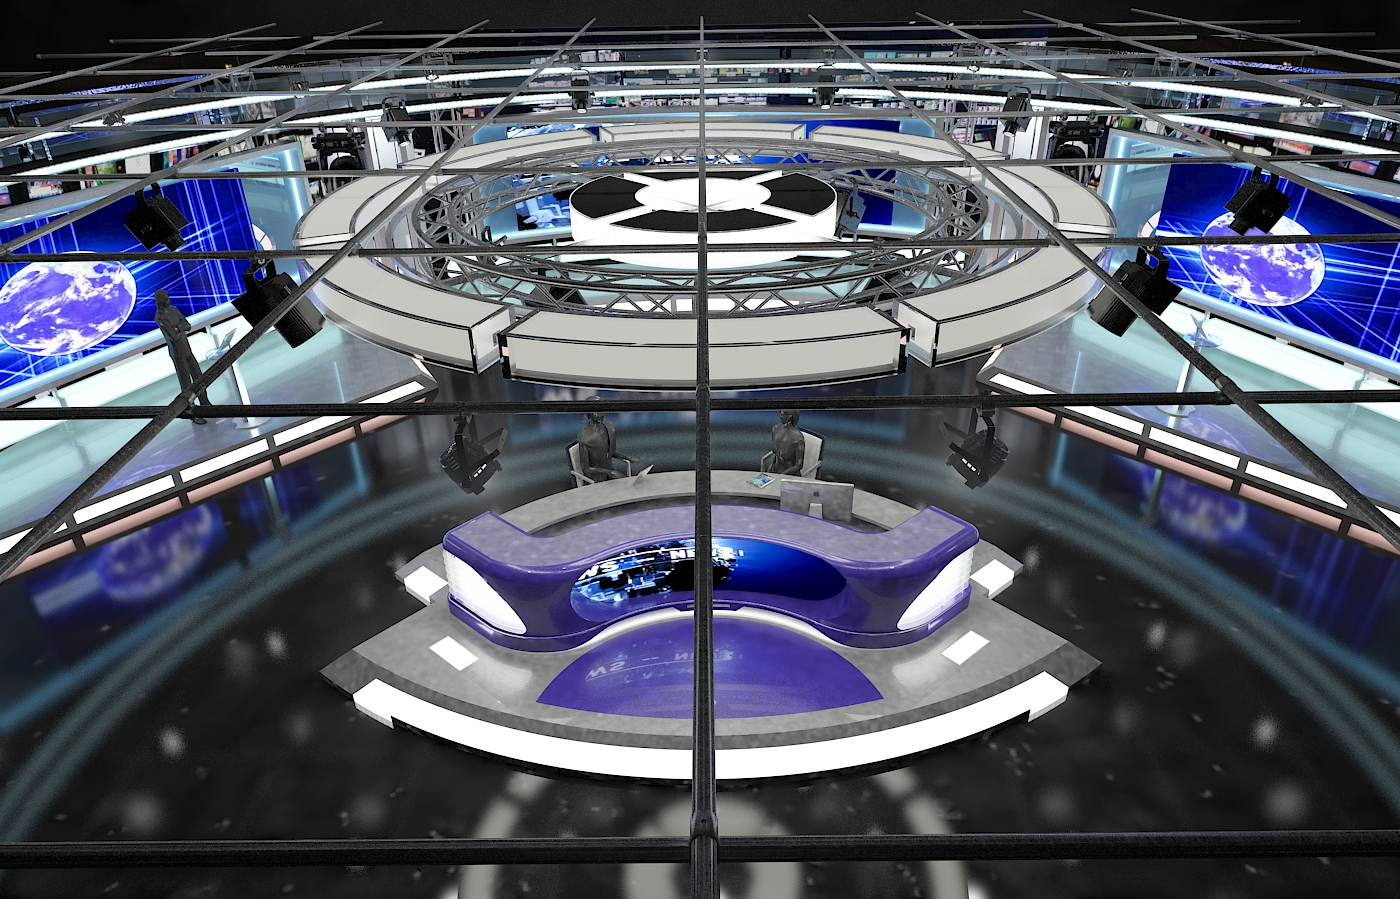 виртуал телевизийн студи цуглуулга vol 6 3d загвар max dxf dwg fbx obj 223376